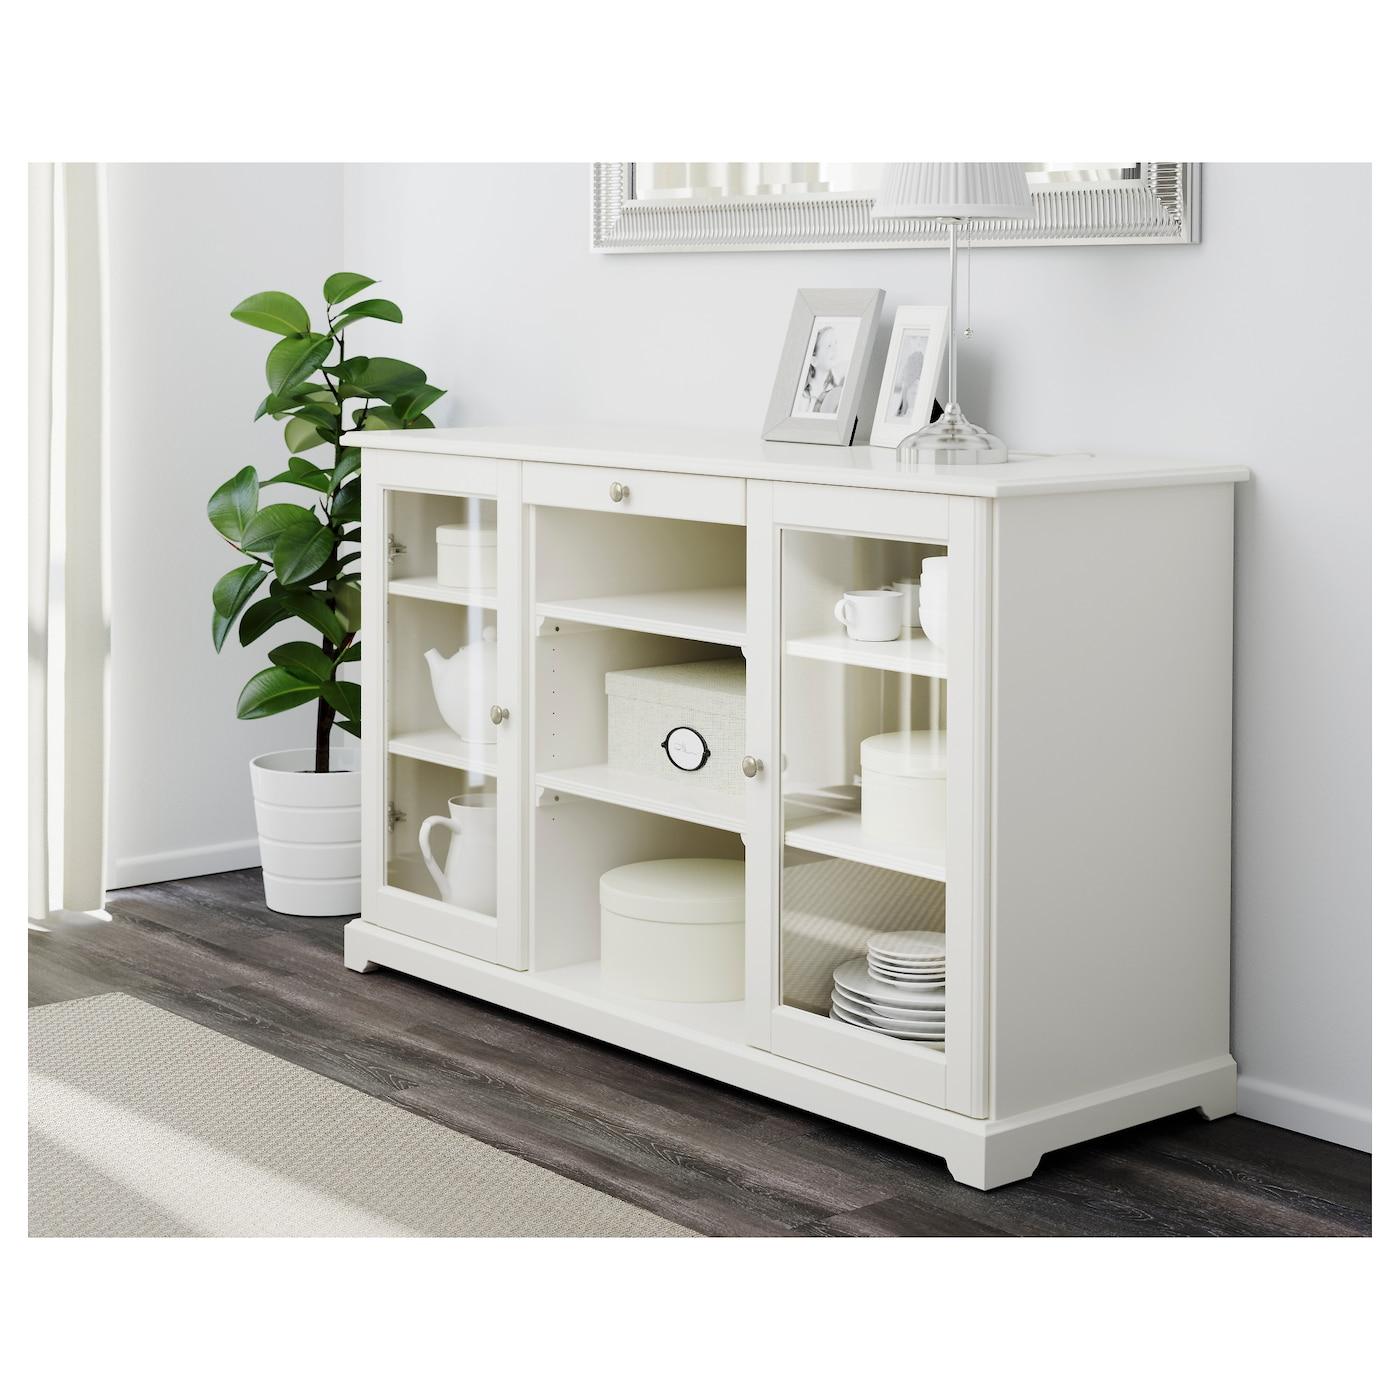 liatorp buffet blanc 145x87 cm ikea. Black Bedroom Furniture Sets. Home Design Ideas